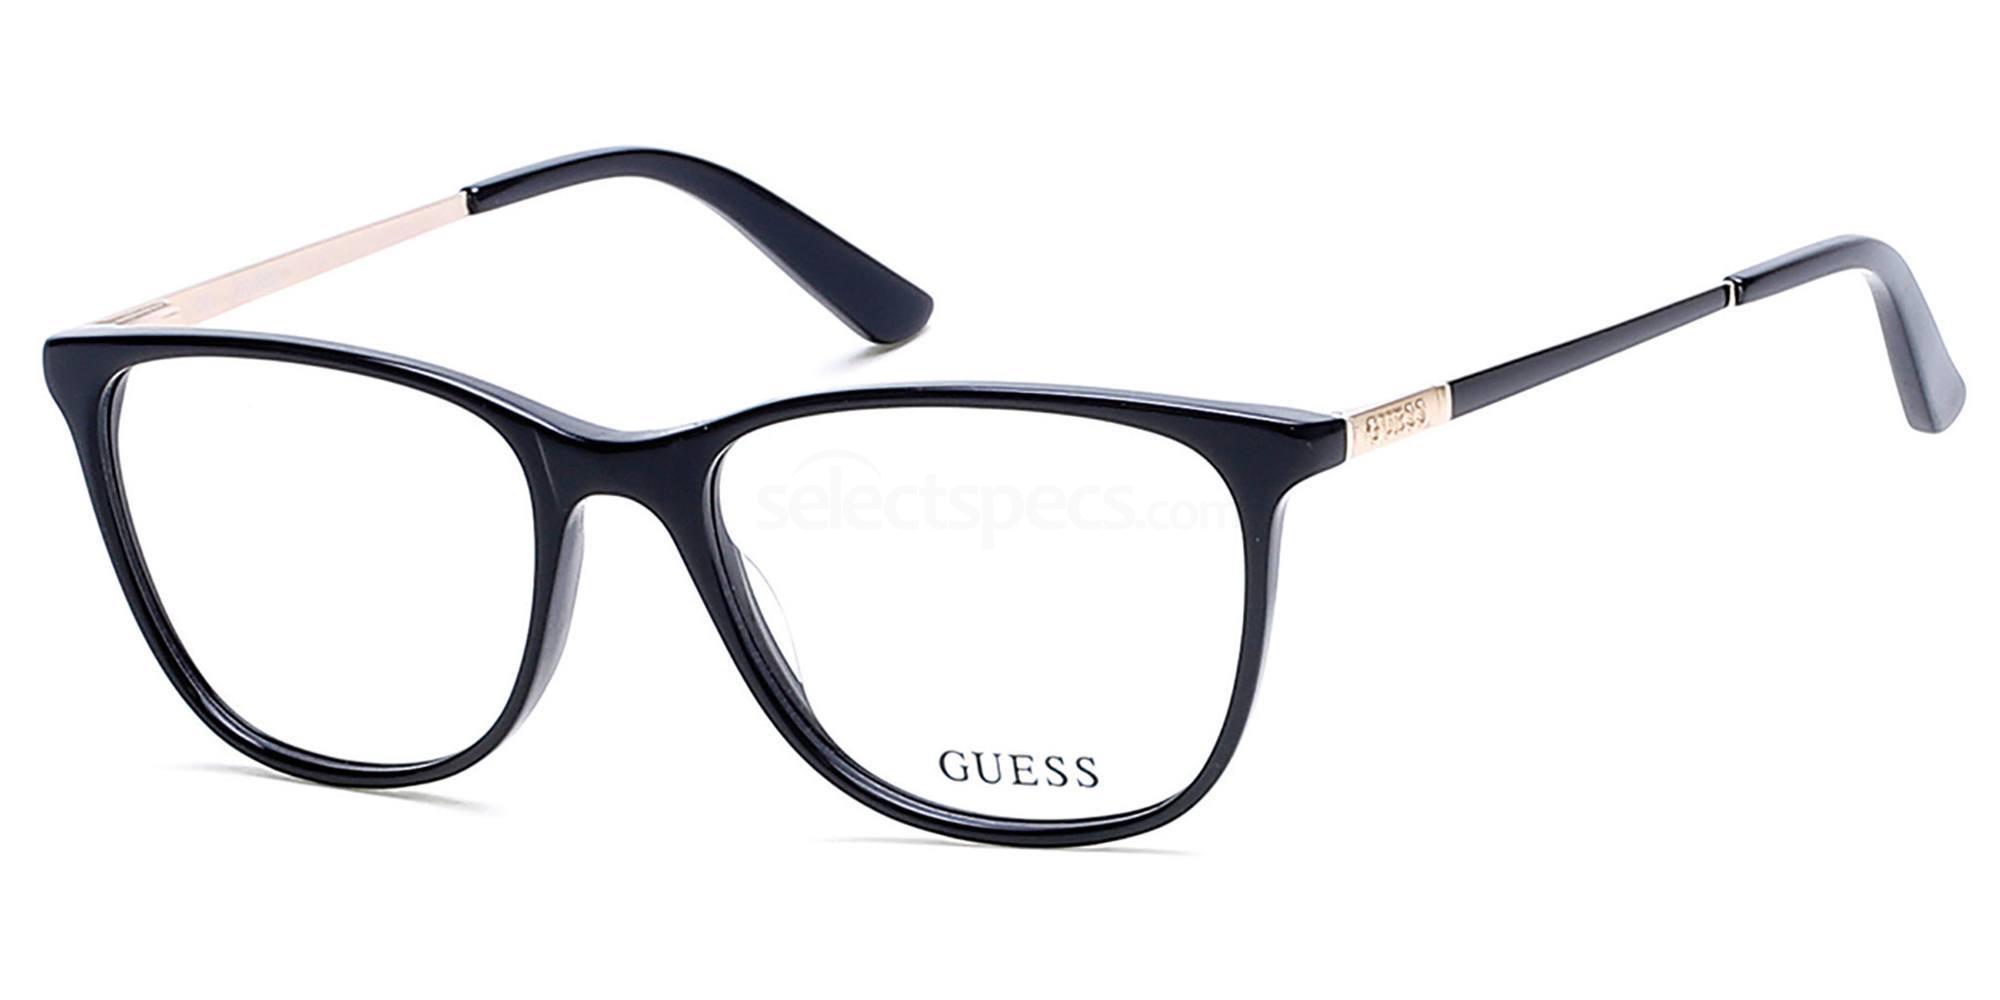 005 GU2566 Glasses, Guess